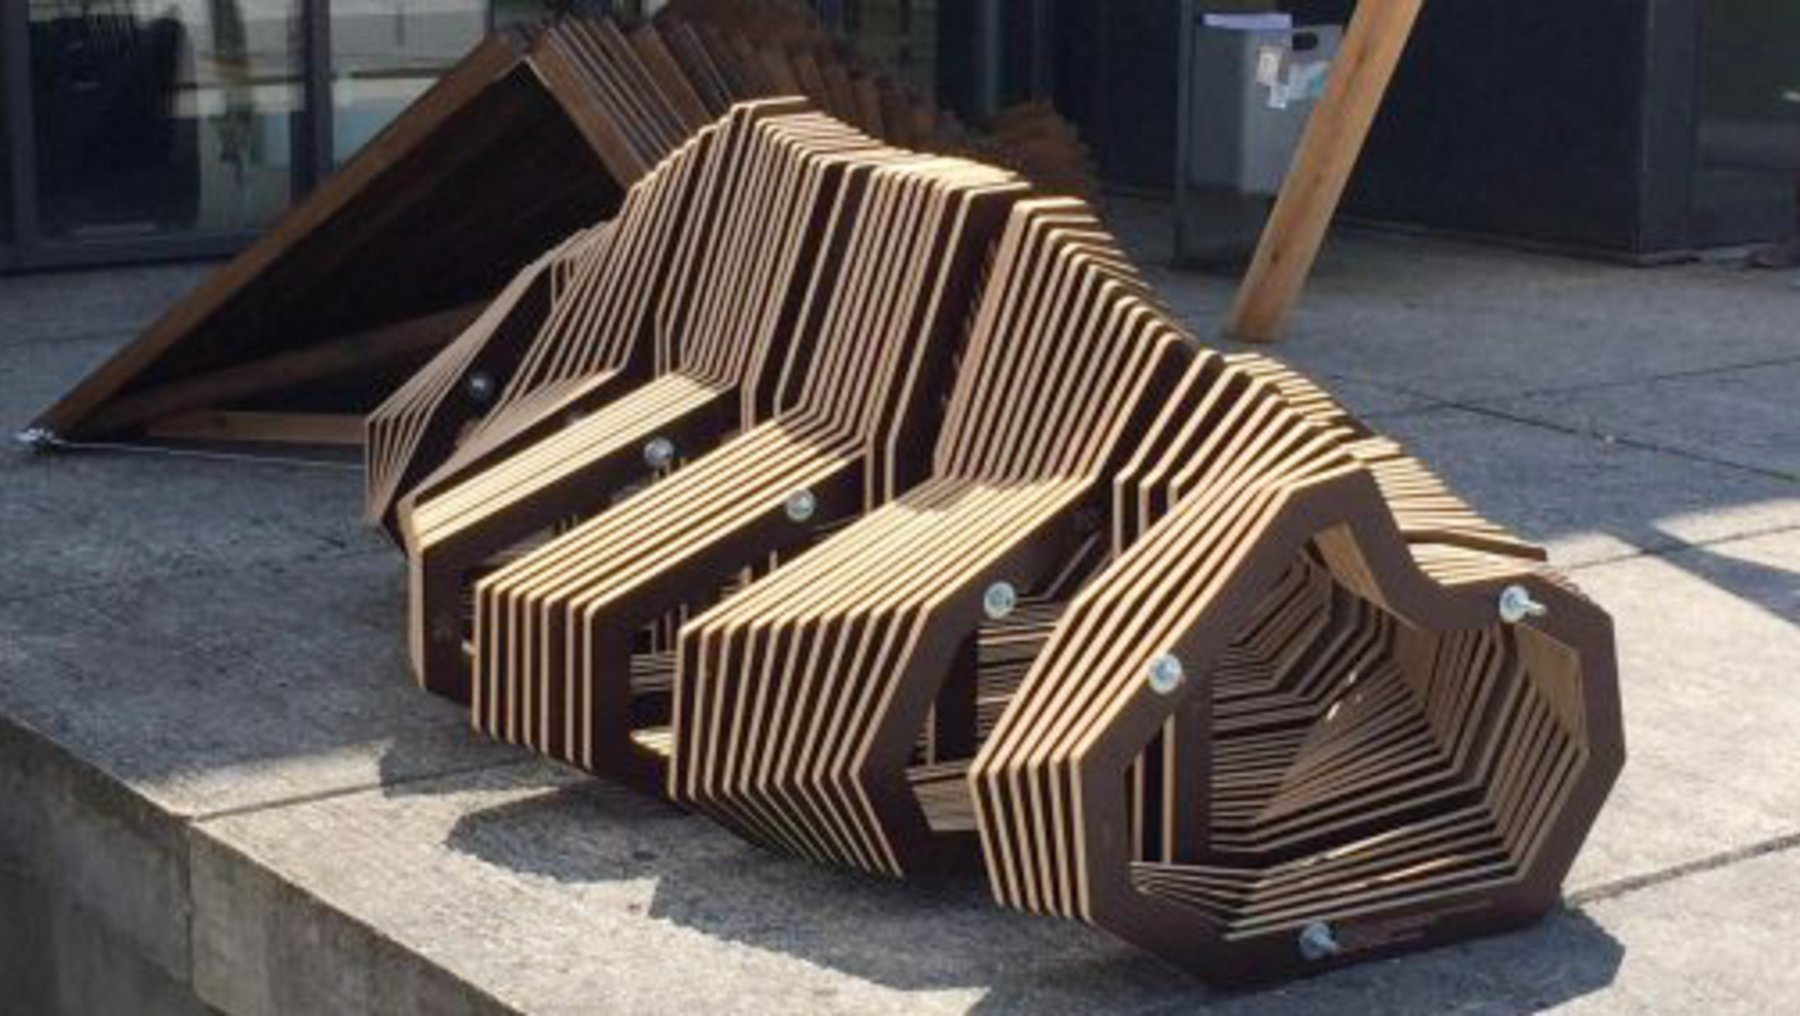 Park 'n' Seat Bench